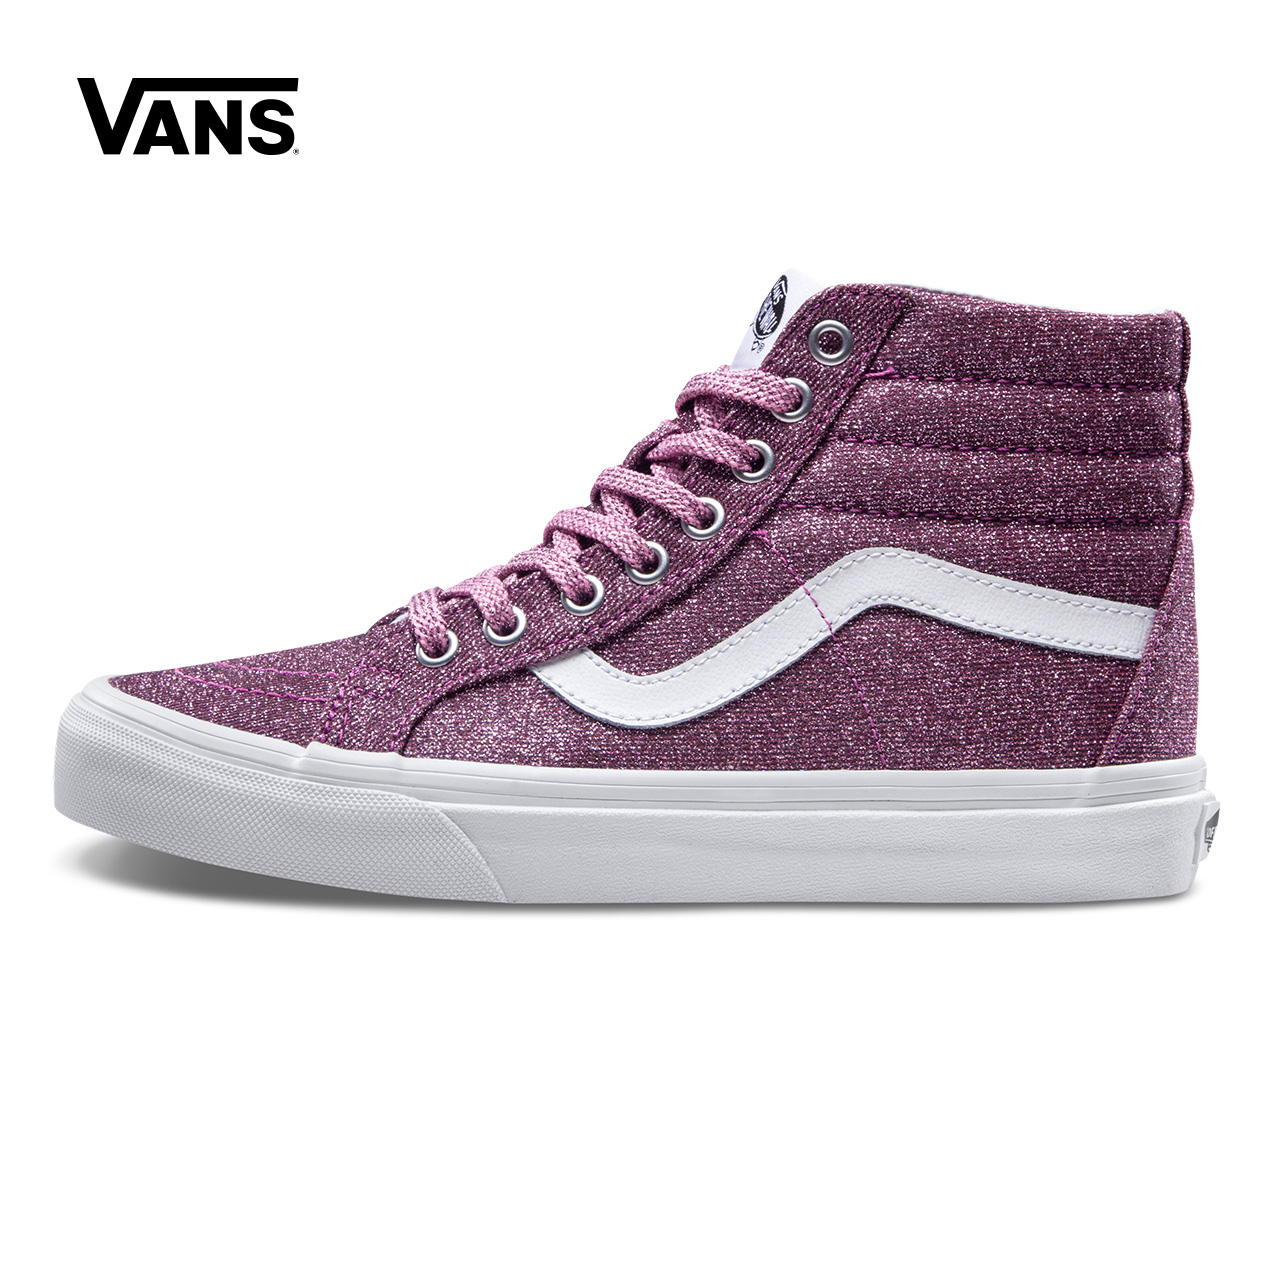 Vans 范斯官方女款SK8-HI板鞋|VN0A2XSBU3U-U3T